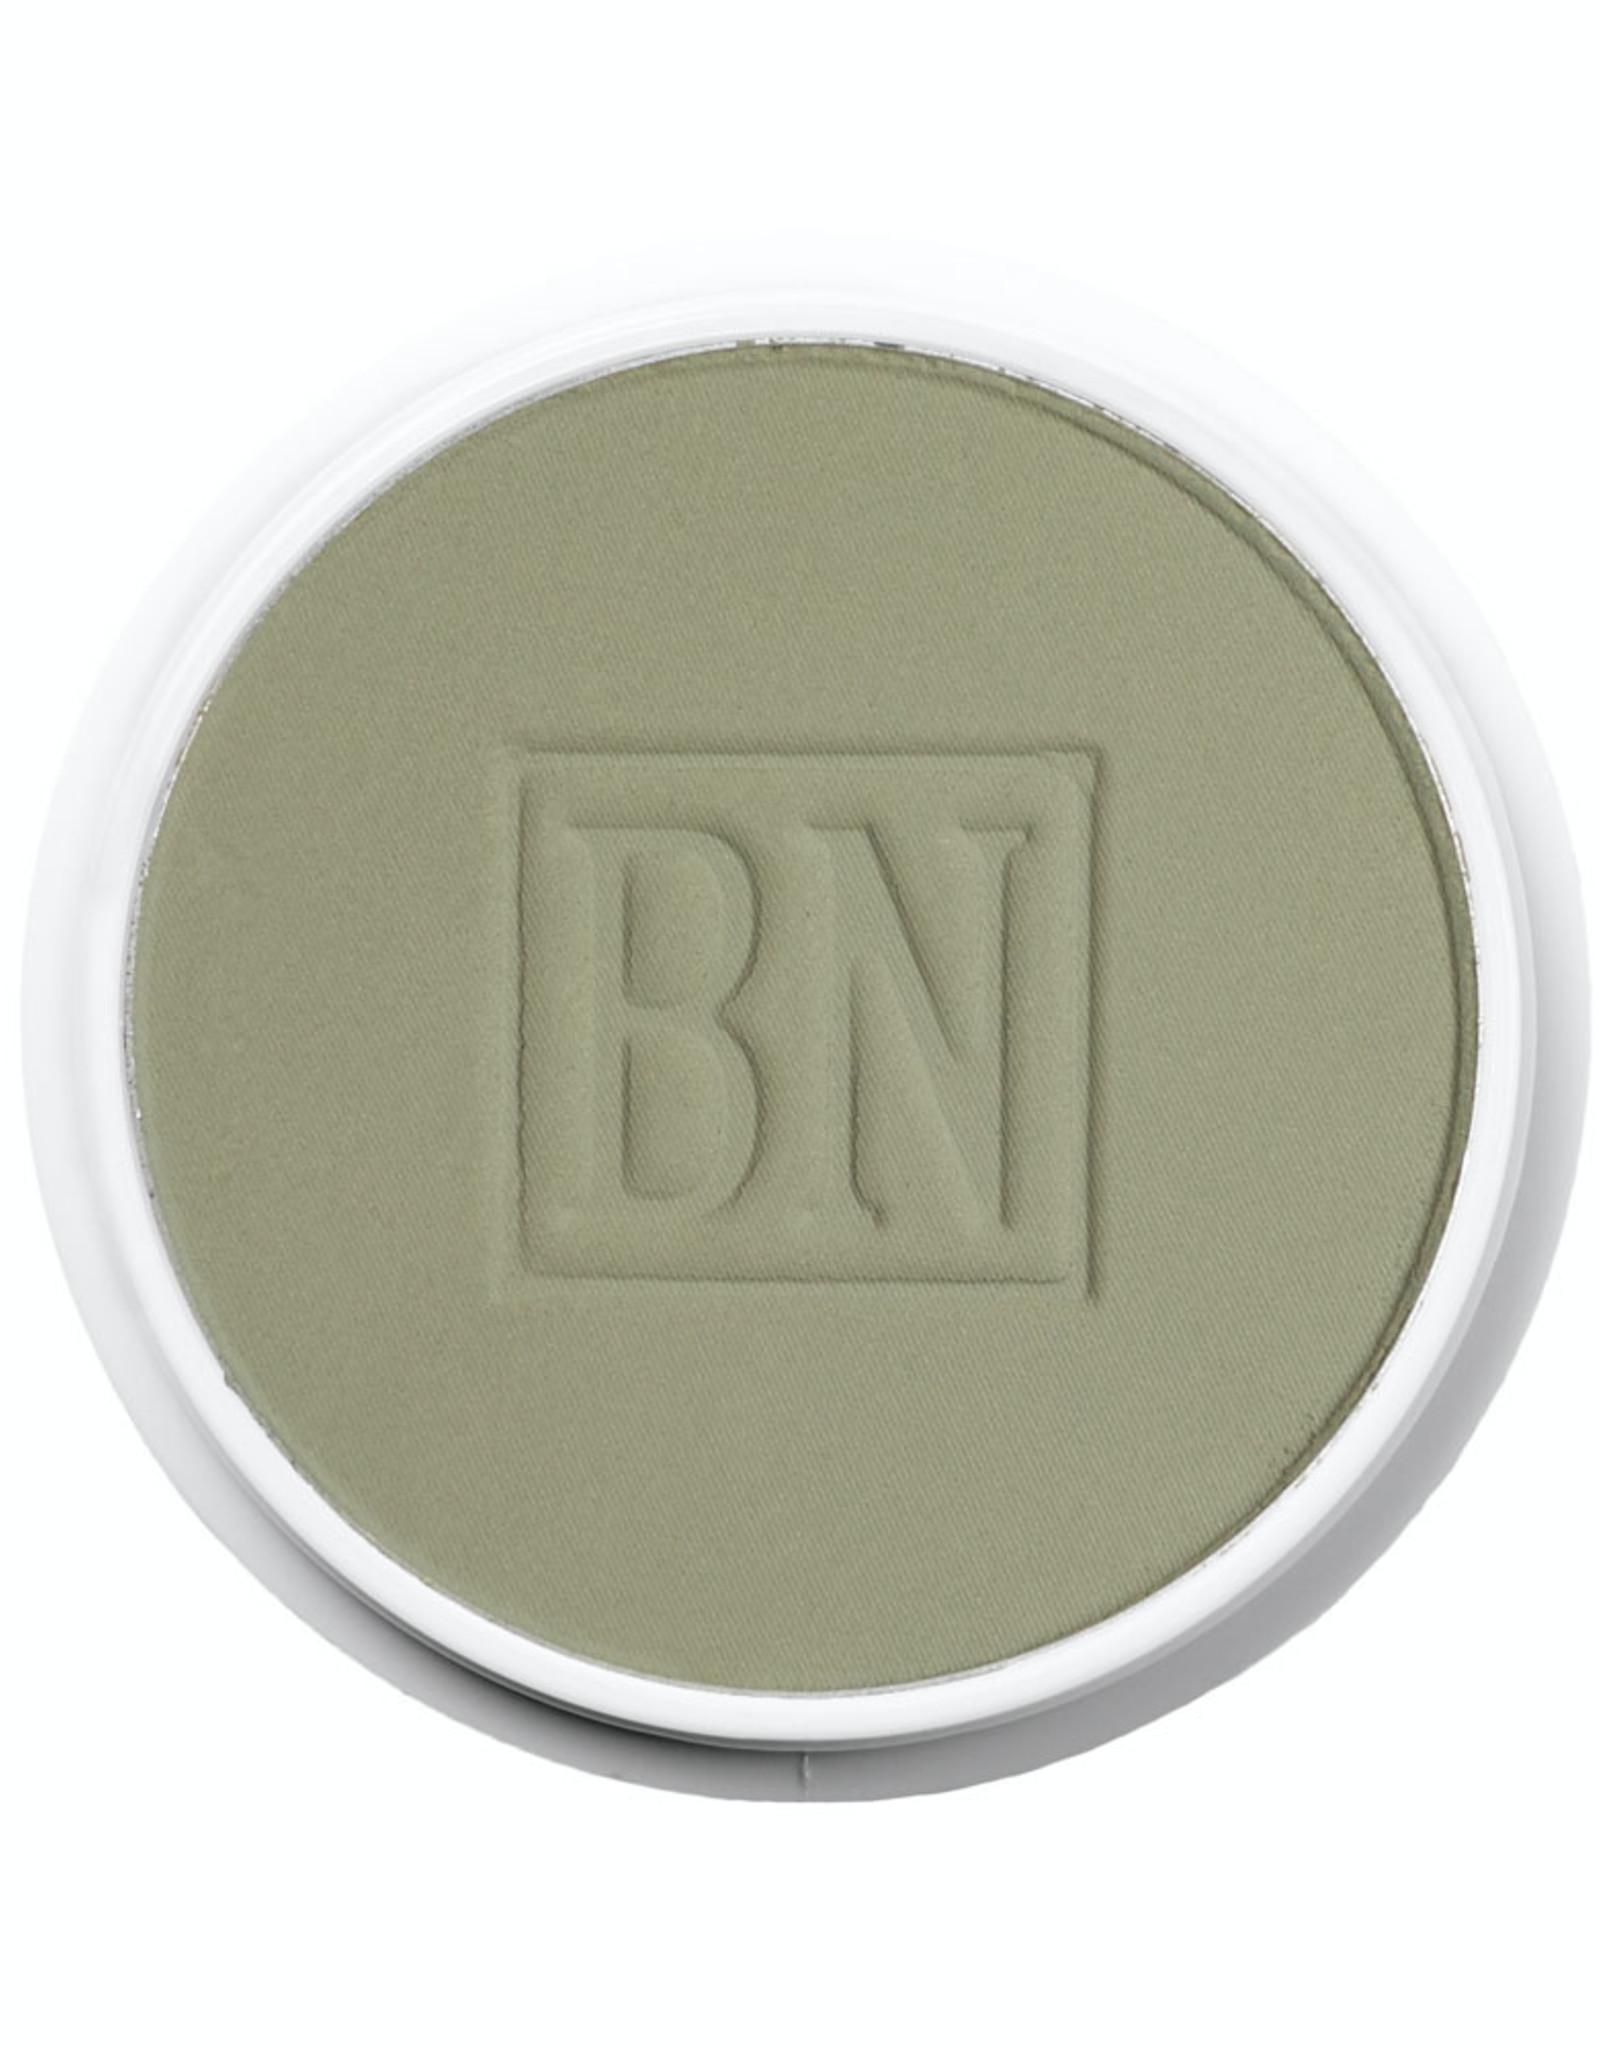 Ben Nye FOUNDATION-CAKE, FRANKENSTEIN, 1 OZ